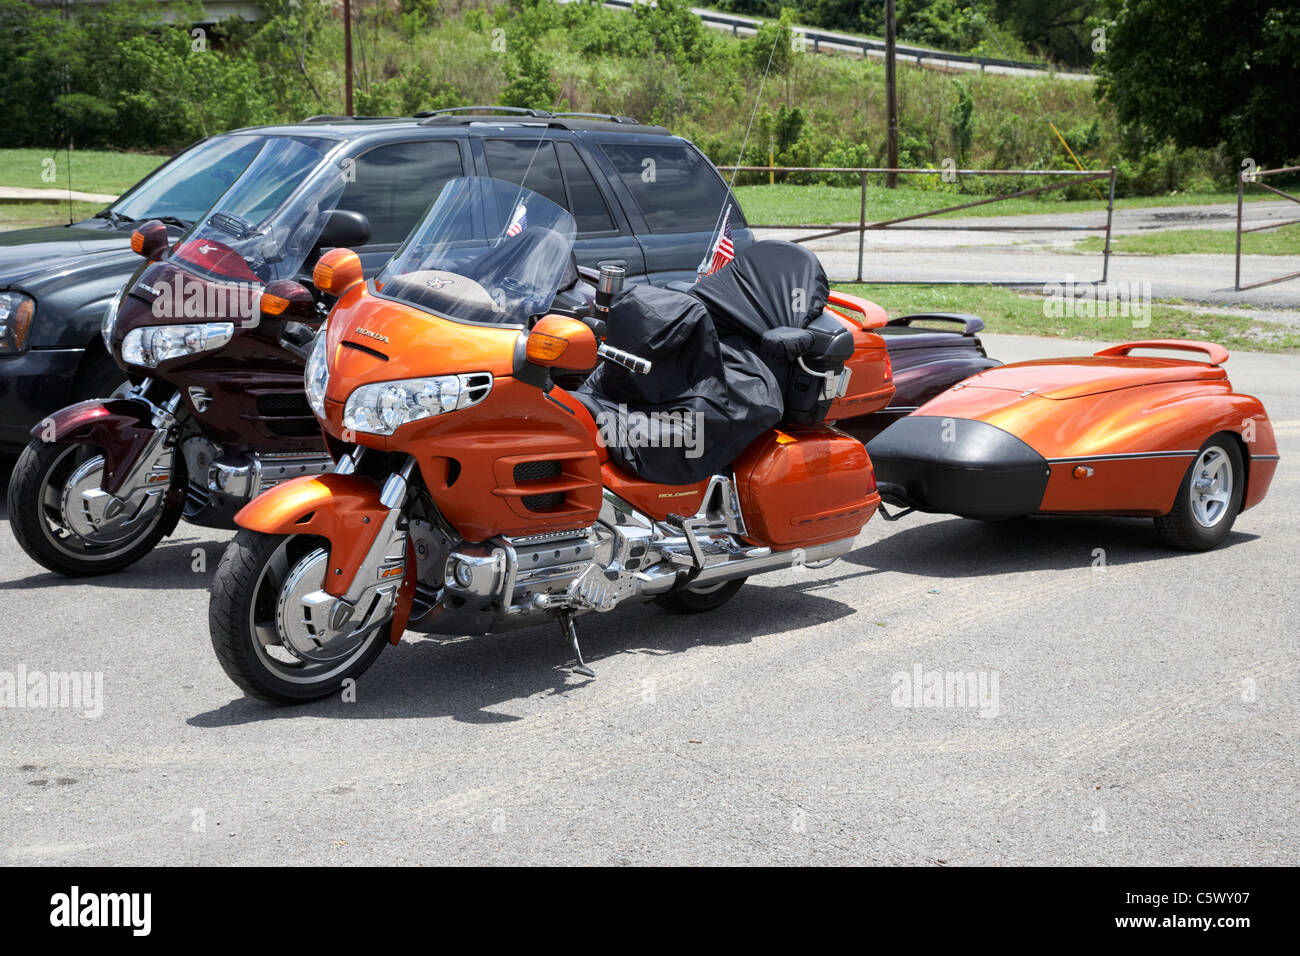 honda goldwing touring motorbikes with trailer lynchburg